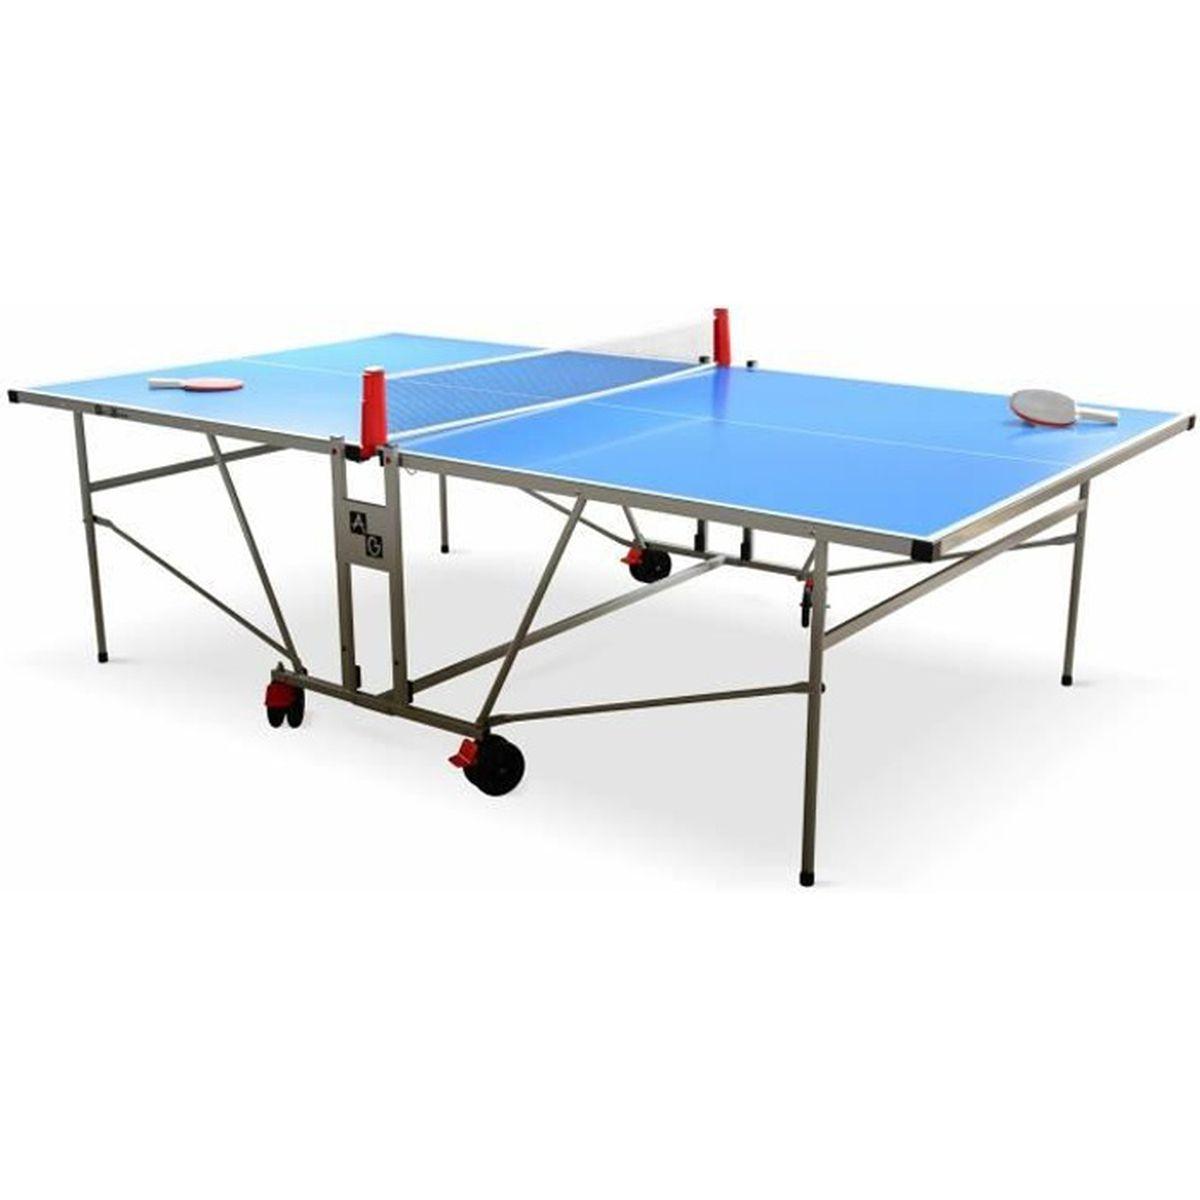 Table de ping pong outdoor bleue avec 2 raquettes et 3 - Table de ping pong pas cher decathlon ...